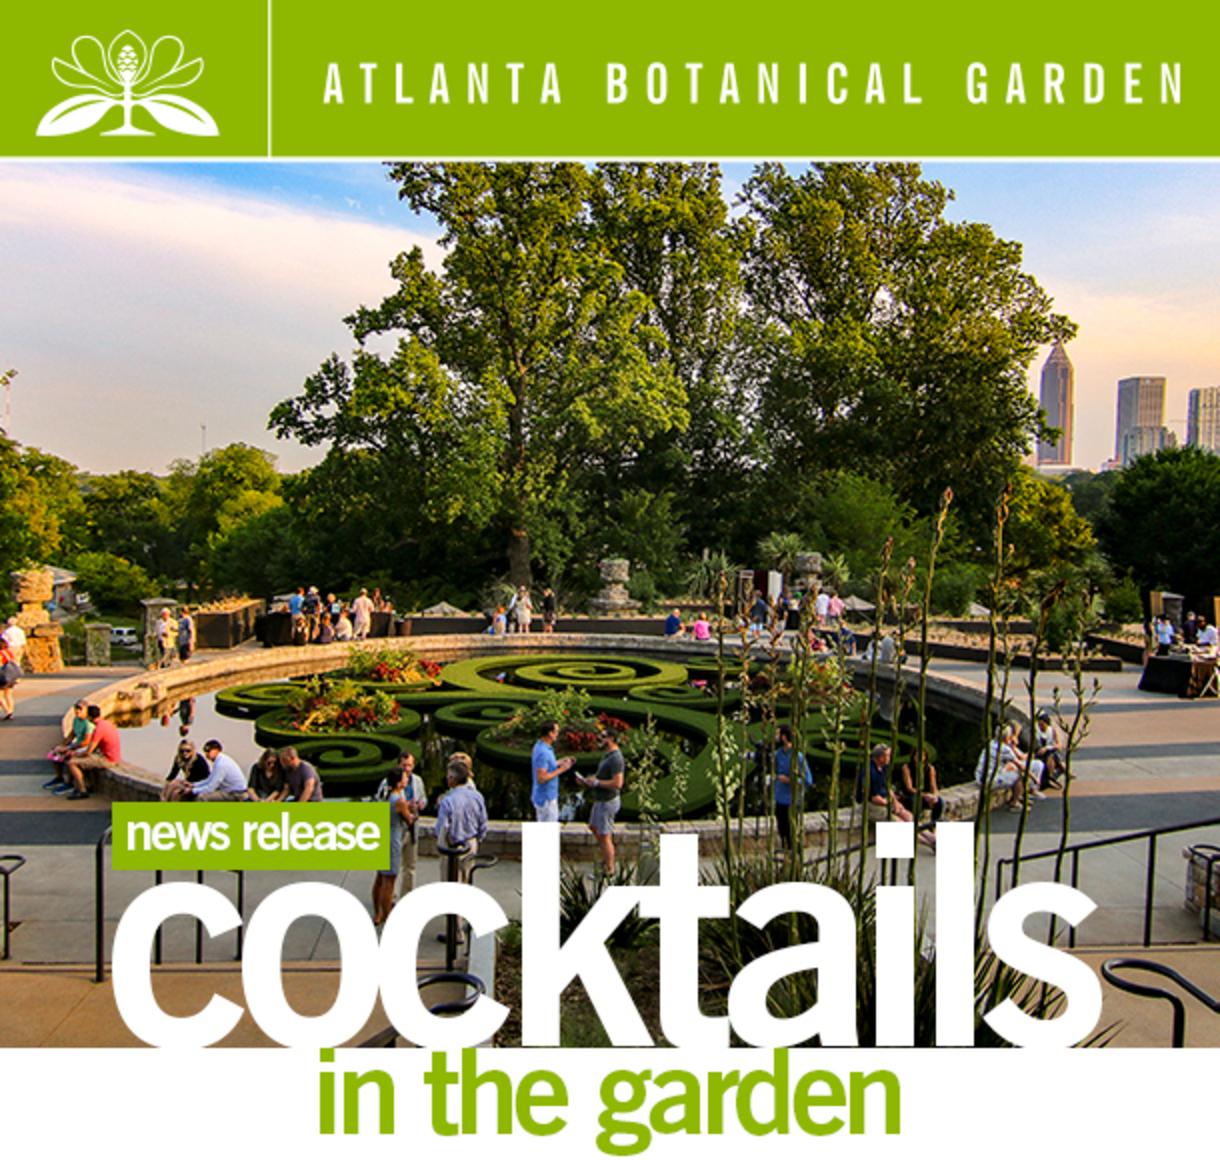 Cocktails in the Garden